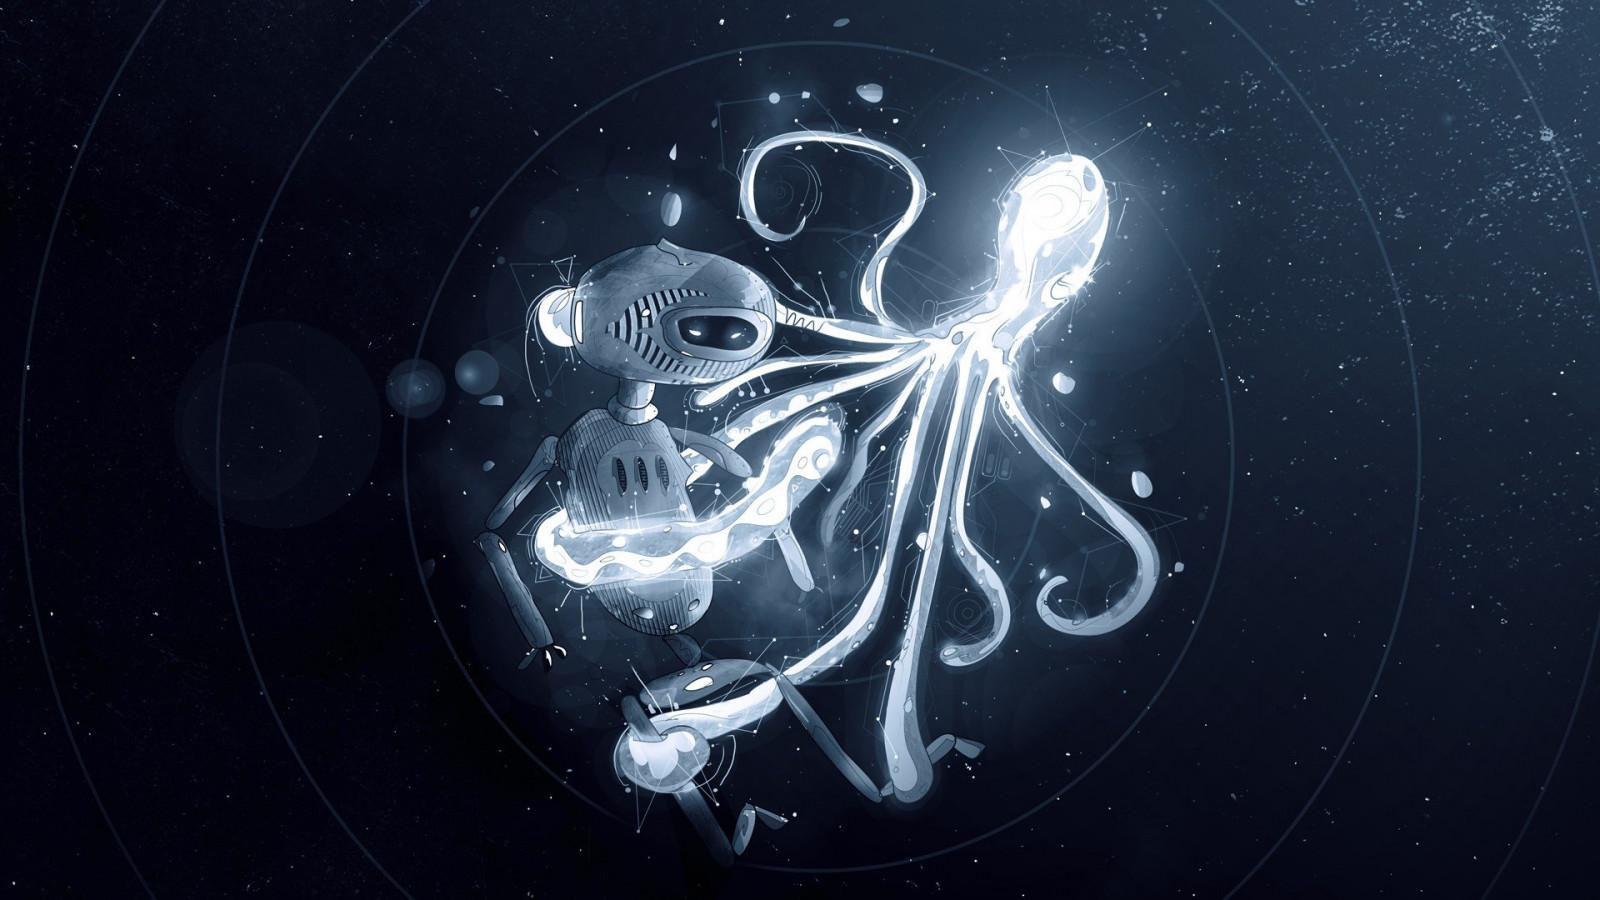 illustration robot space artwork octopus circle universe darkness screenshot 1920x1080 px computer wallpaper fractal art organ outer space astronomical object